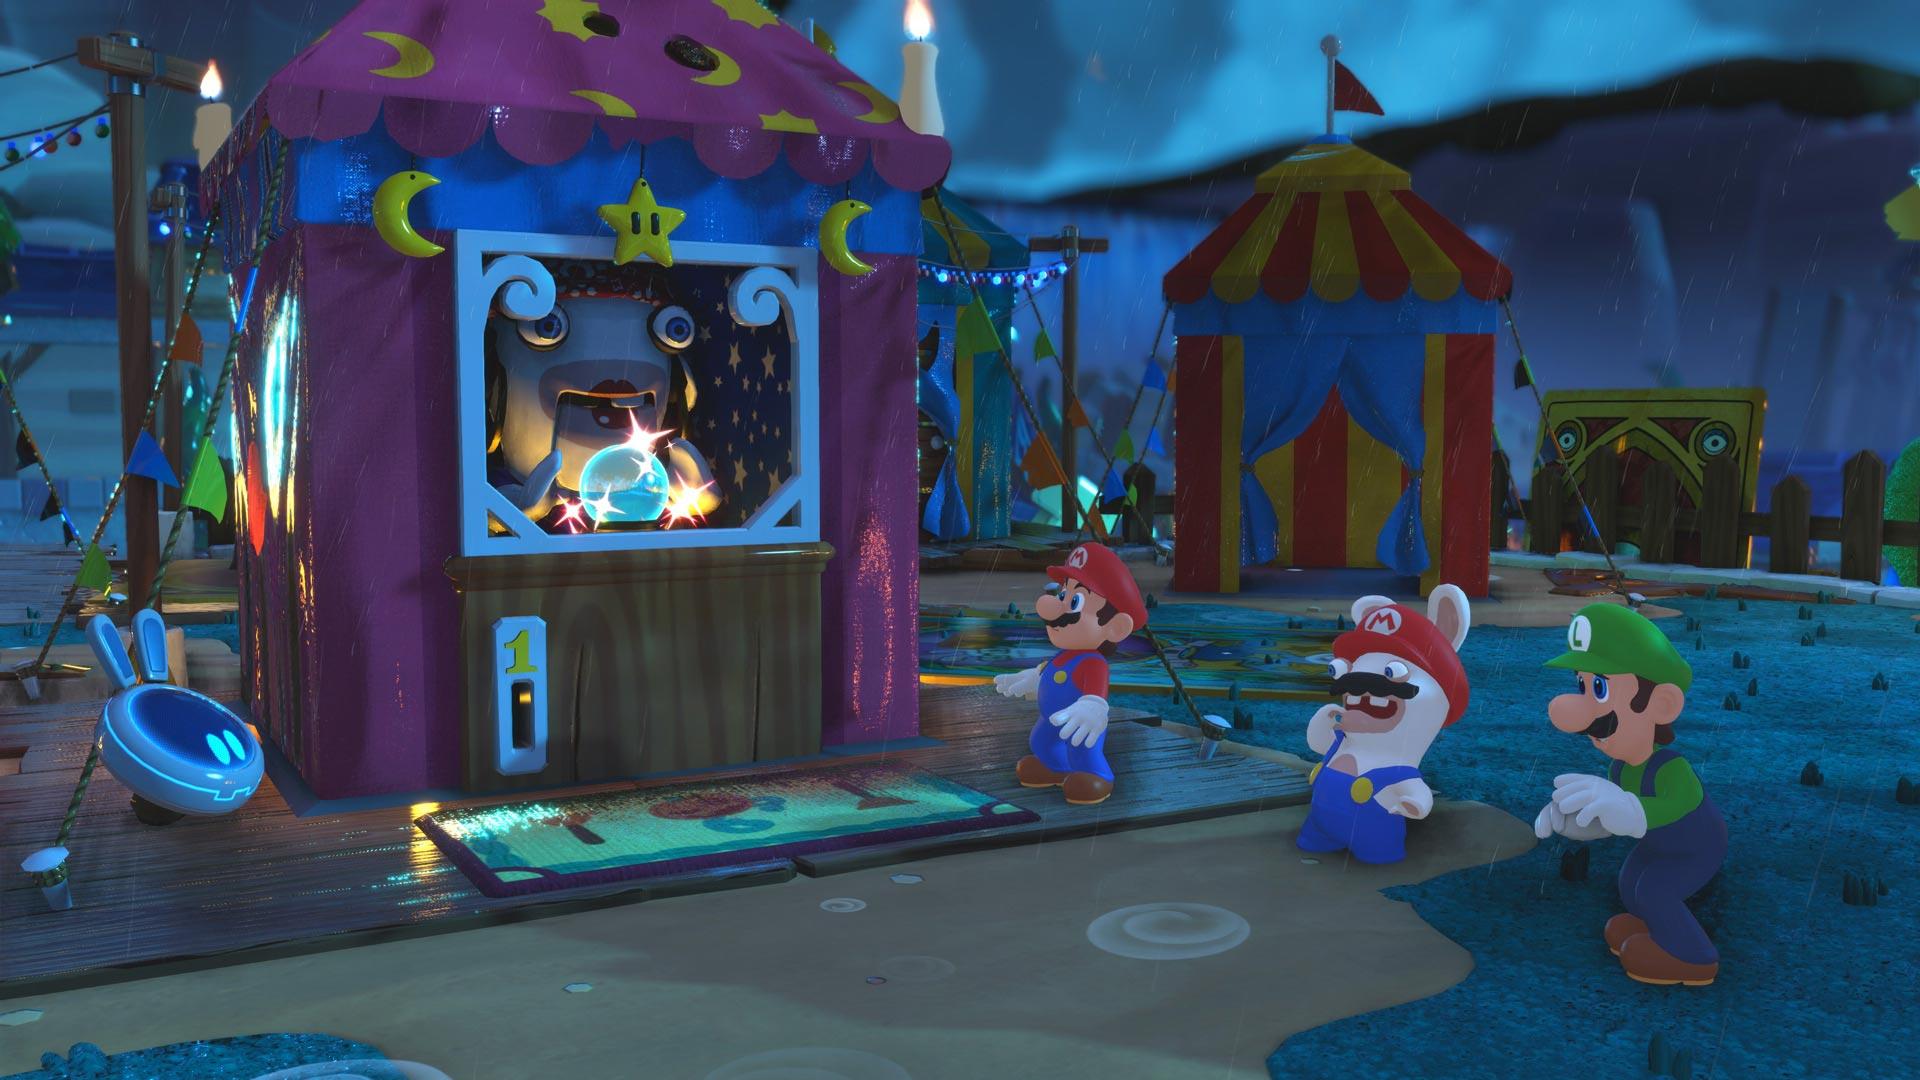 Mario + Rabbids Screenshot